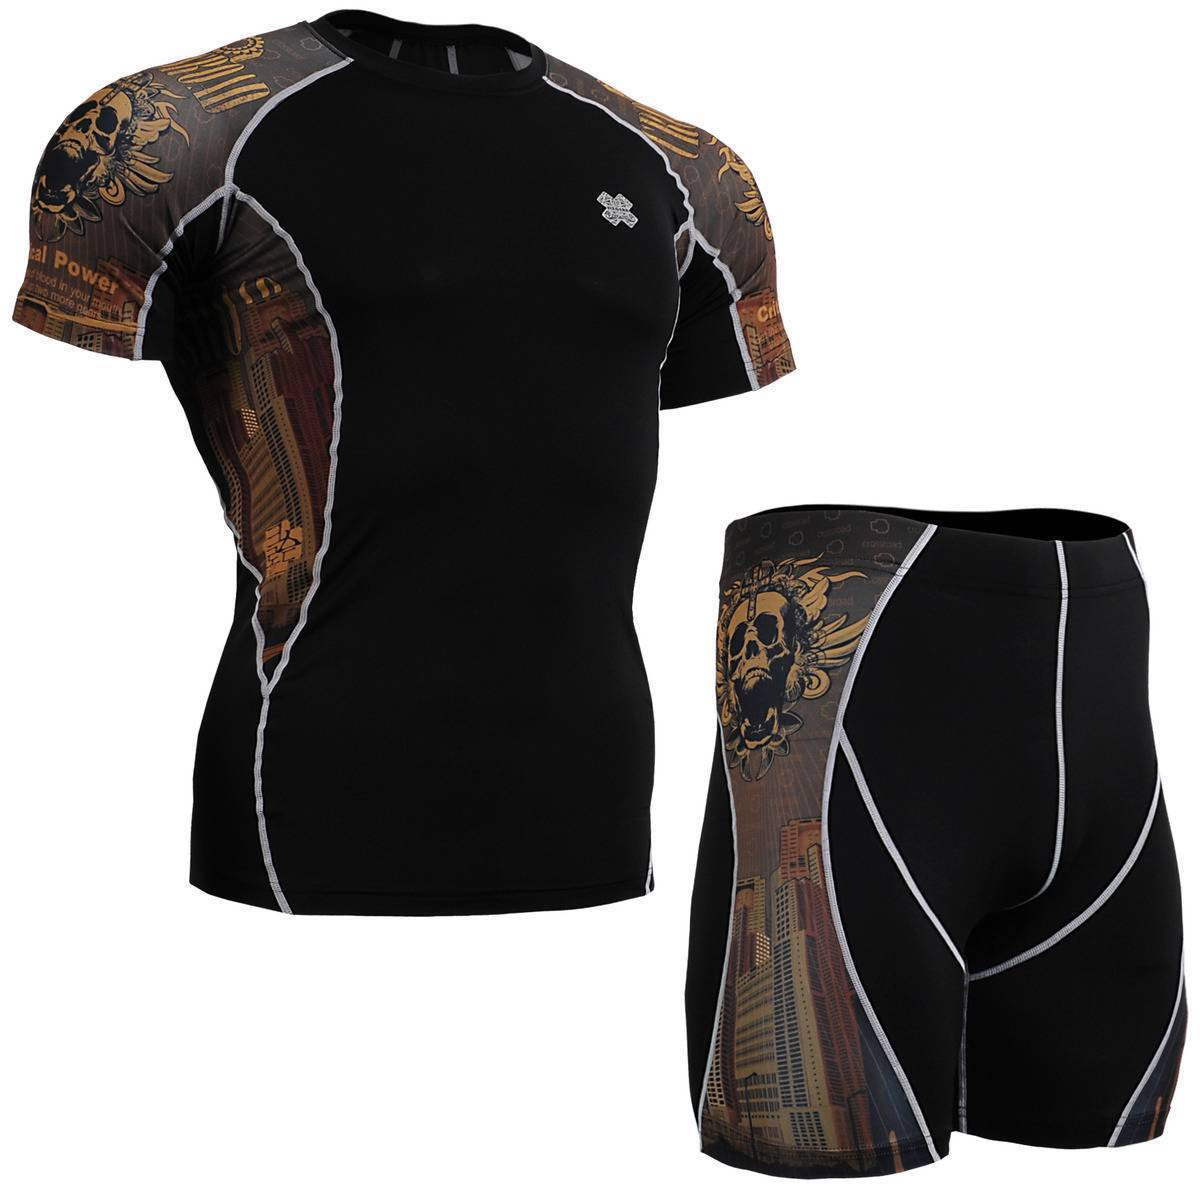 FIXGEAR C2S P2S-B27 SET Compression Shirts & Shorts Skin-tight MMA Training